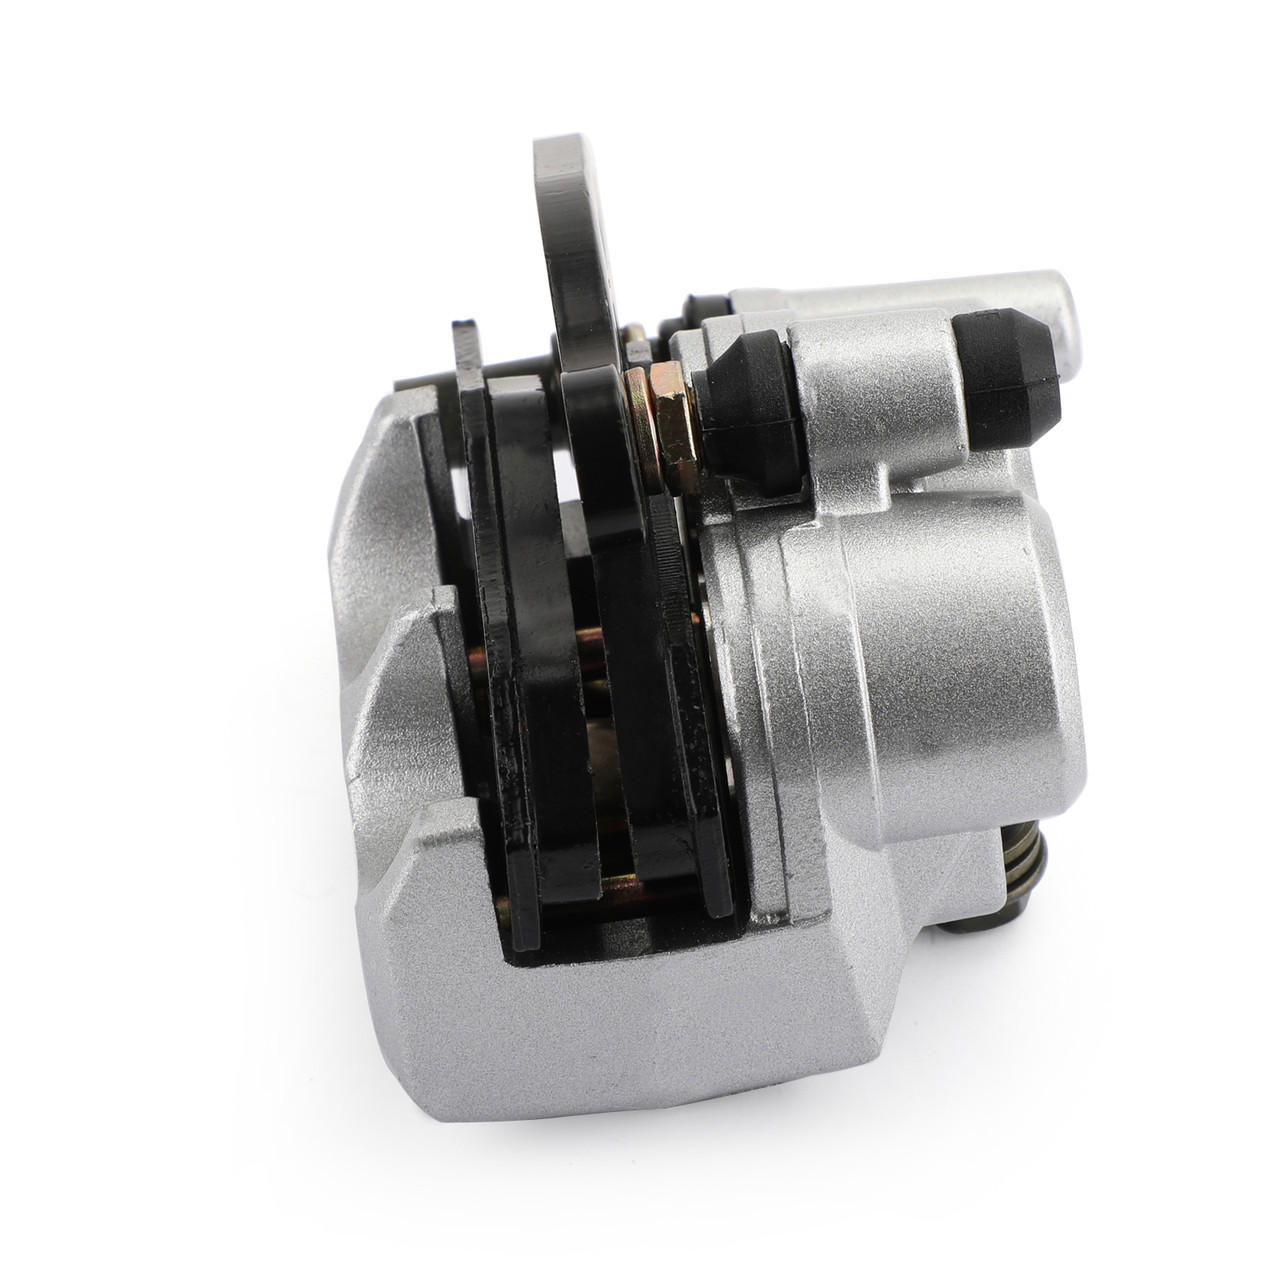 L/&R Front Brake Caliper Set 59300-27C20 For Suzuki RM250 RM125 RMX250 DR350SE GB